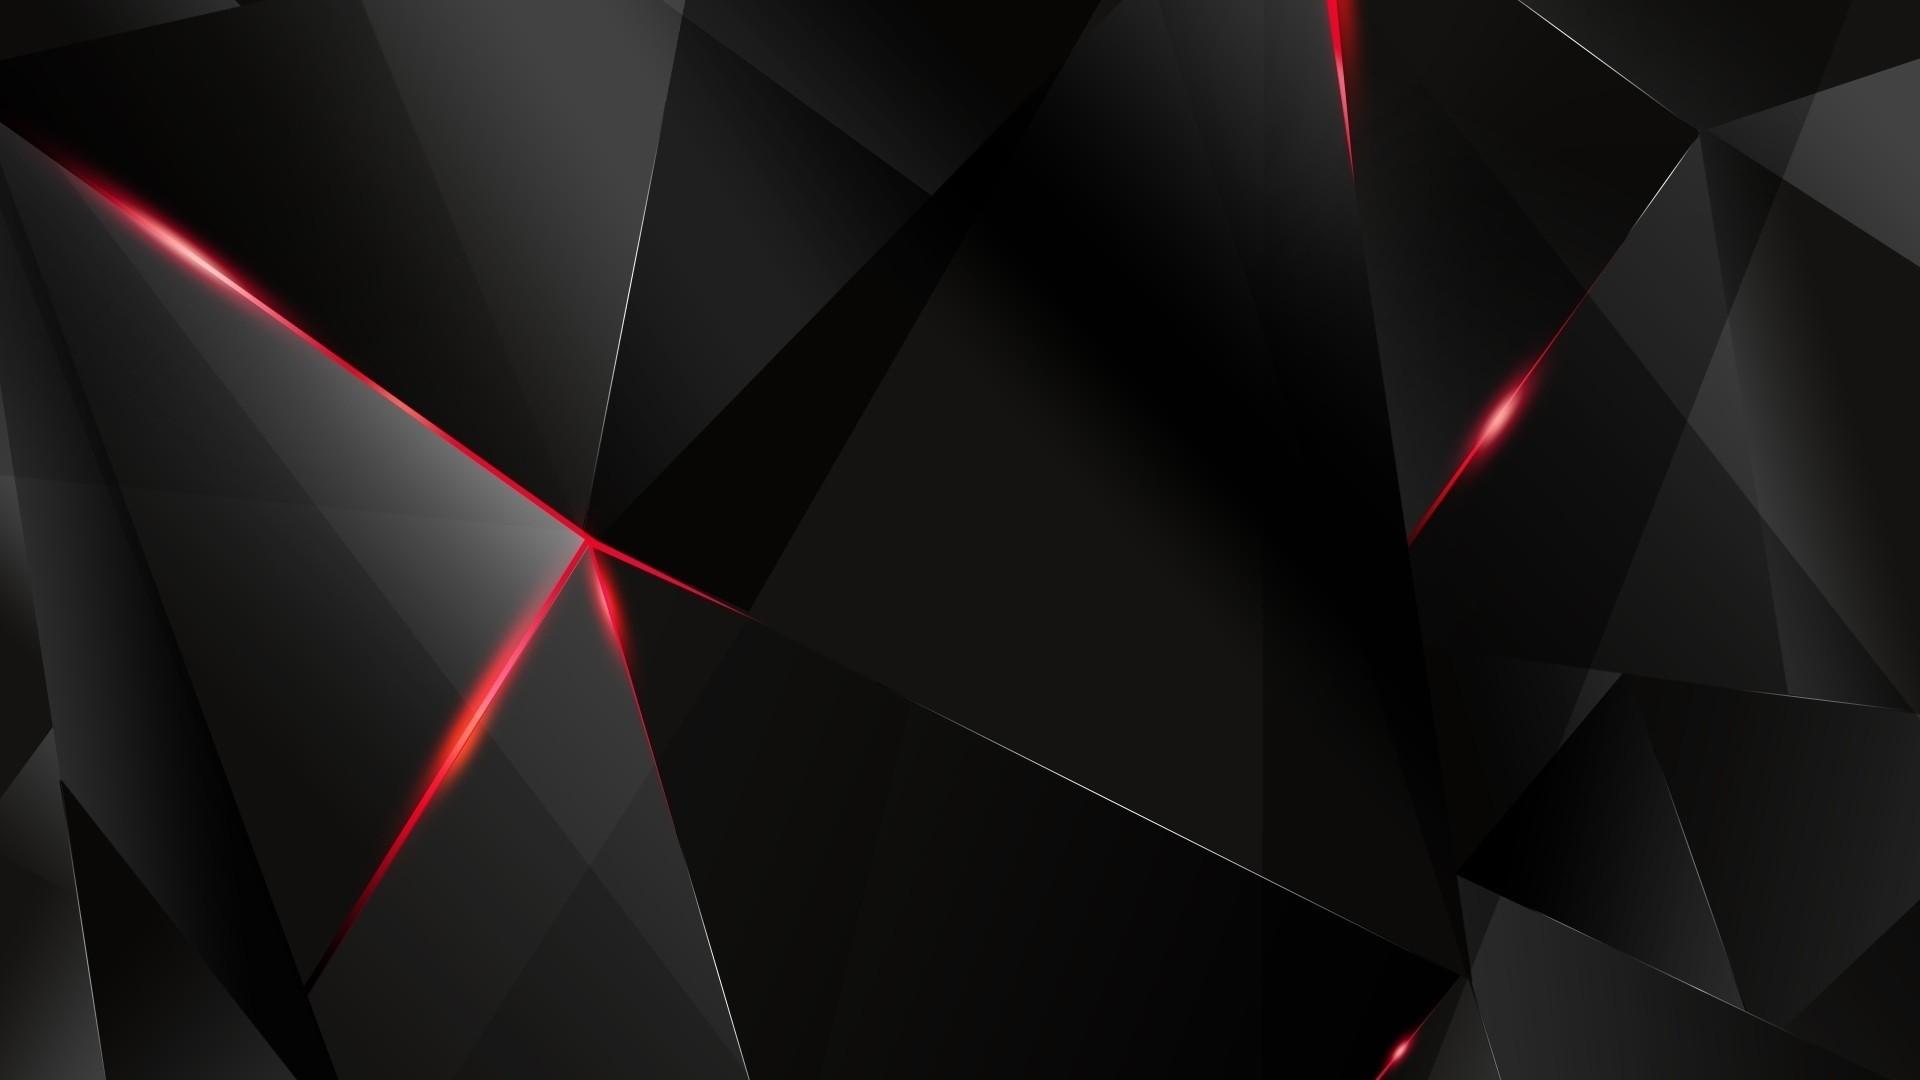 Black Background Leather HD desktop wallpaper Widescreen High